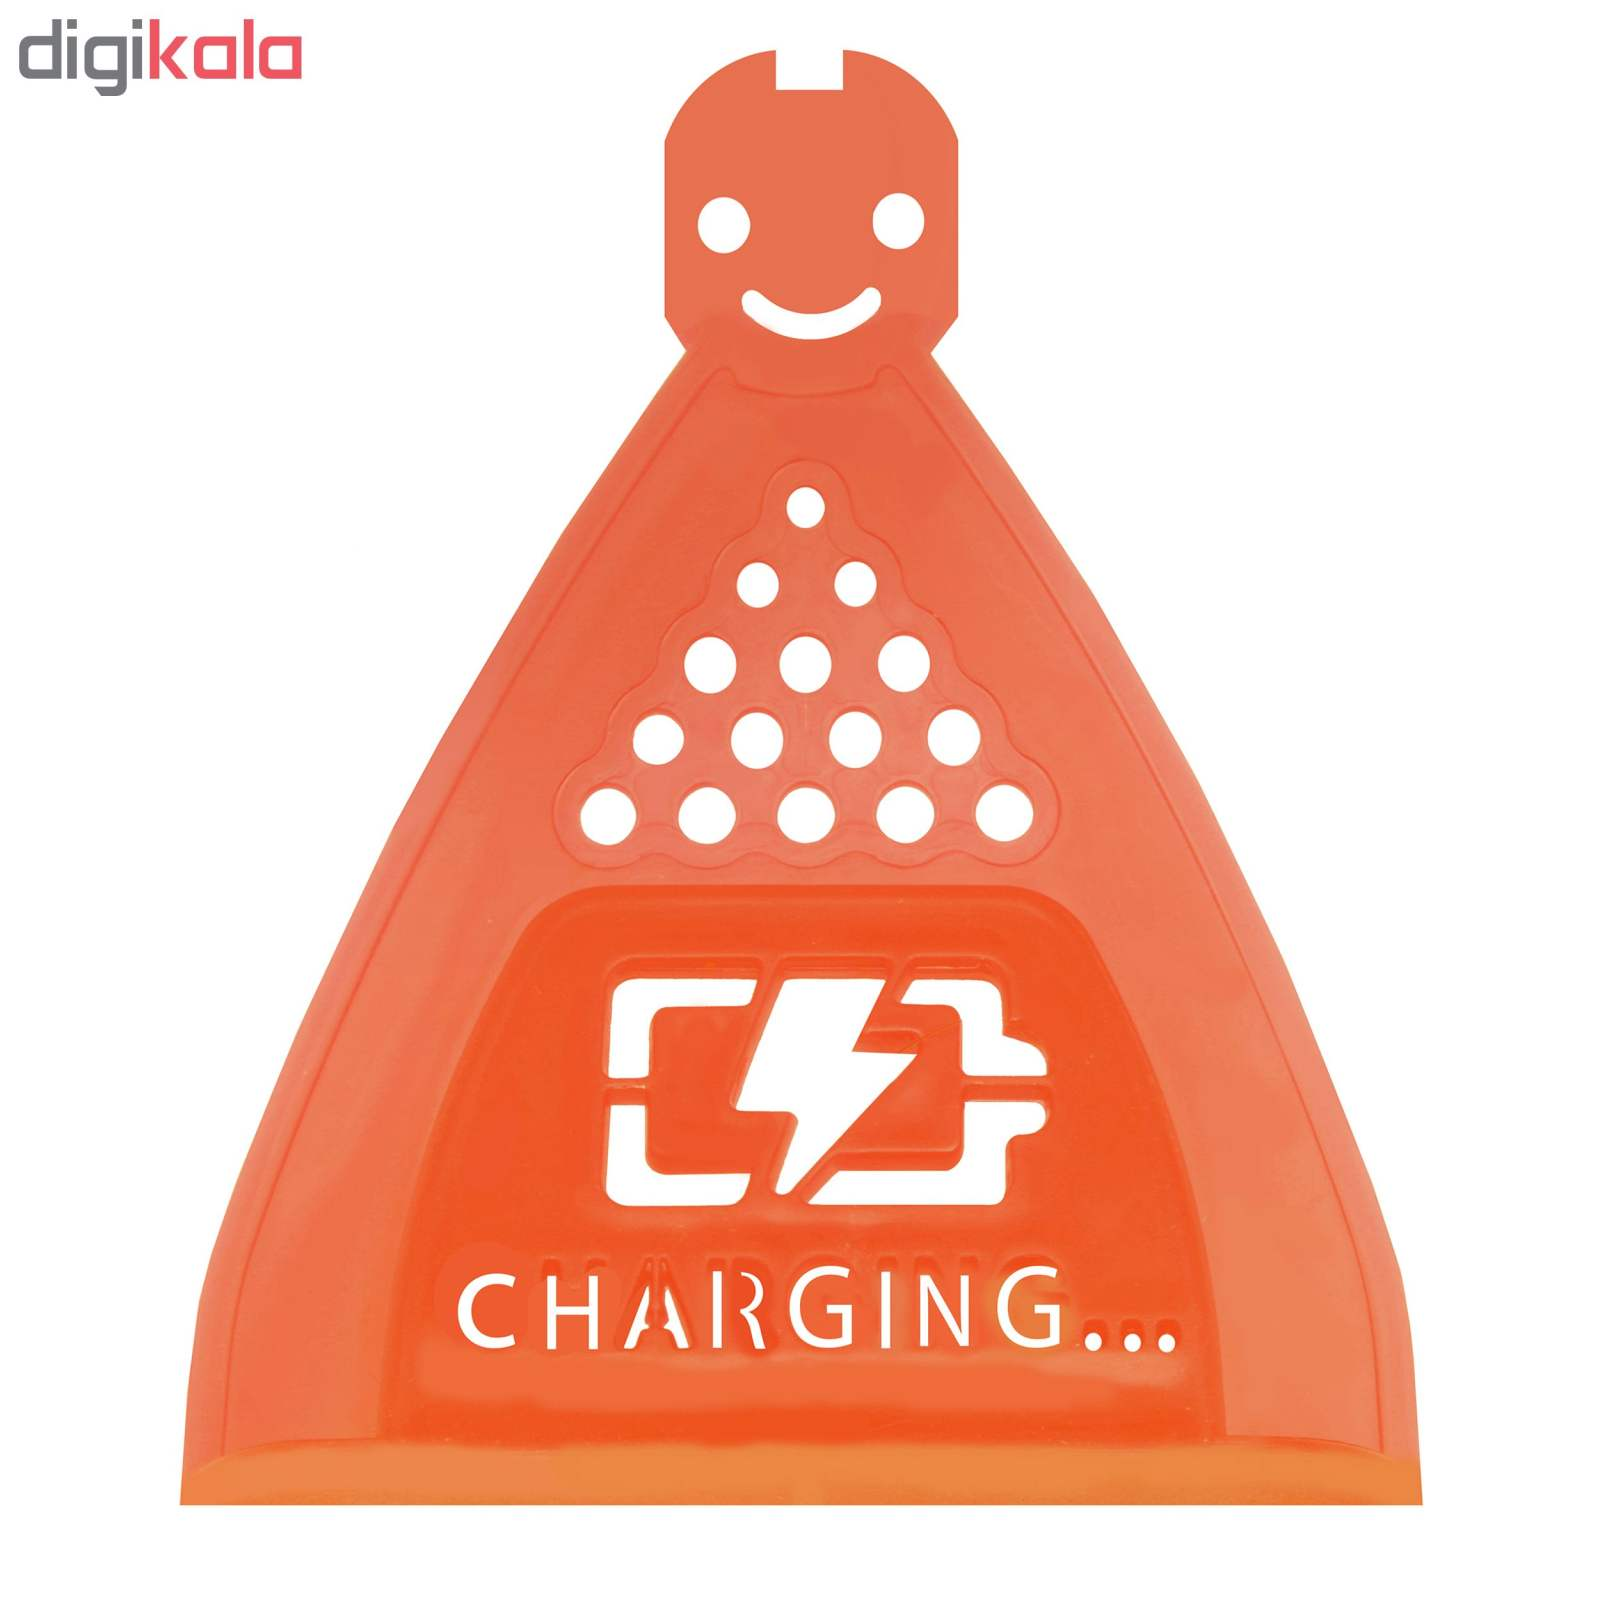 پایه نگهدارنده شارژر موبایل مدل Hng 0229 main 1 5